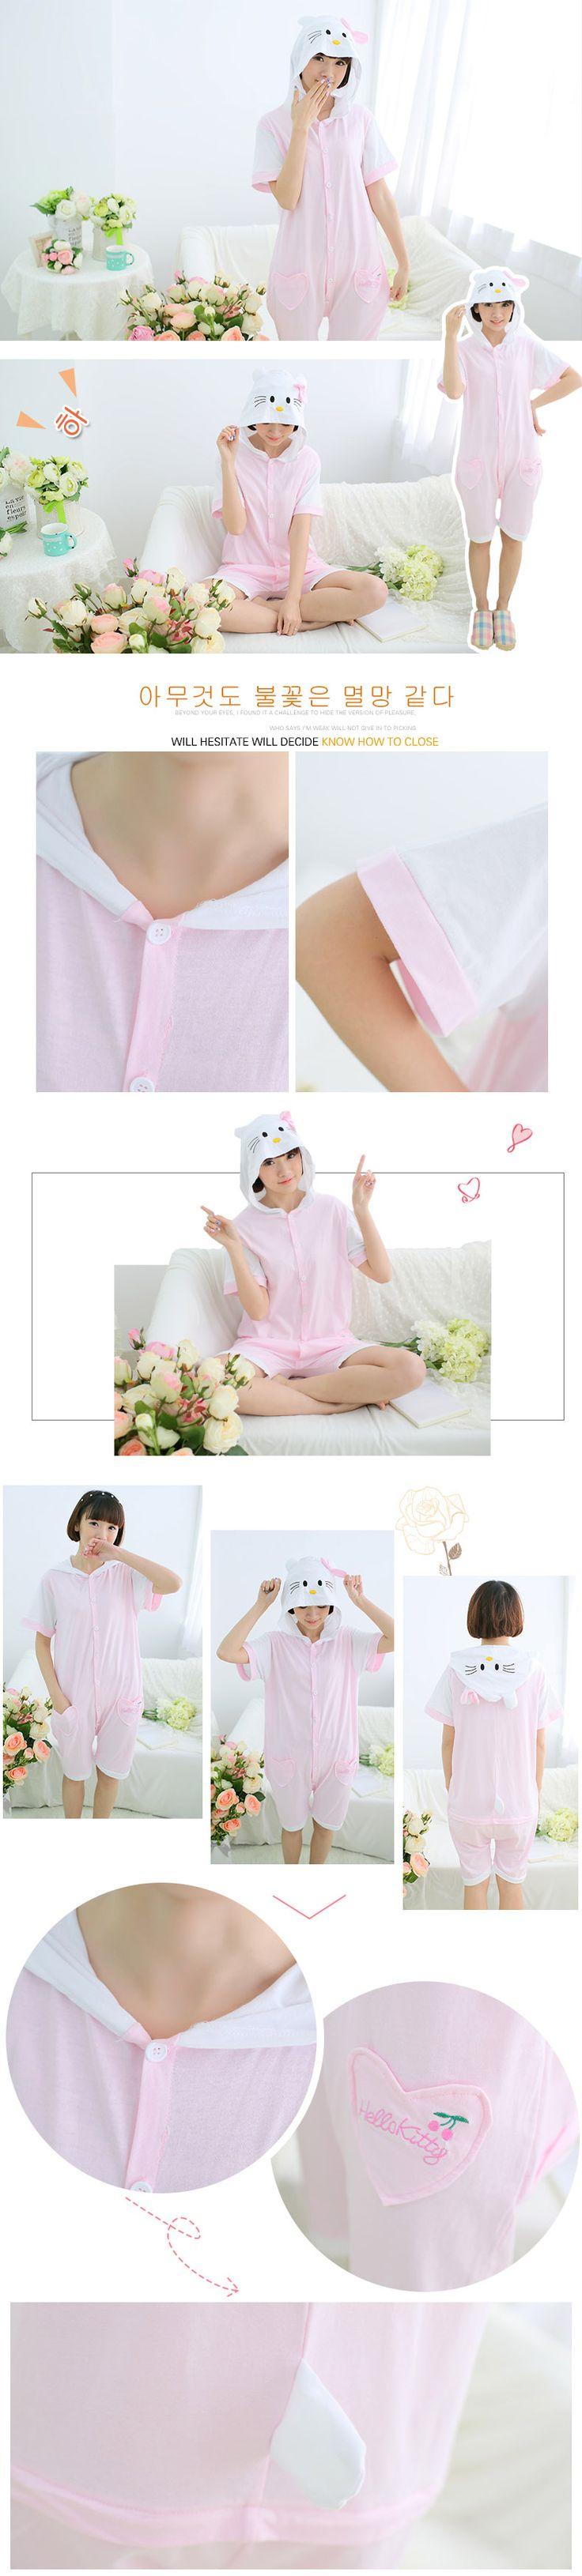 Hello Kitty мультфильм с короткими рукавами летом часть пижамы мужчин и женщин пара отцовство костюм костюм хлопка детей -tmall.com Lynx